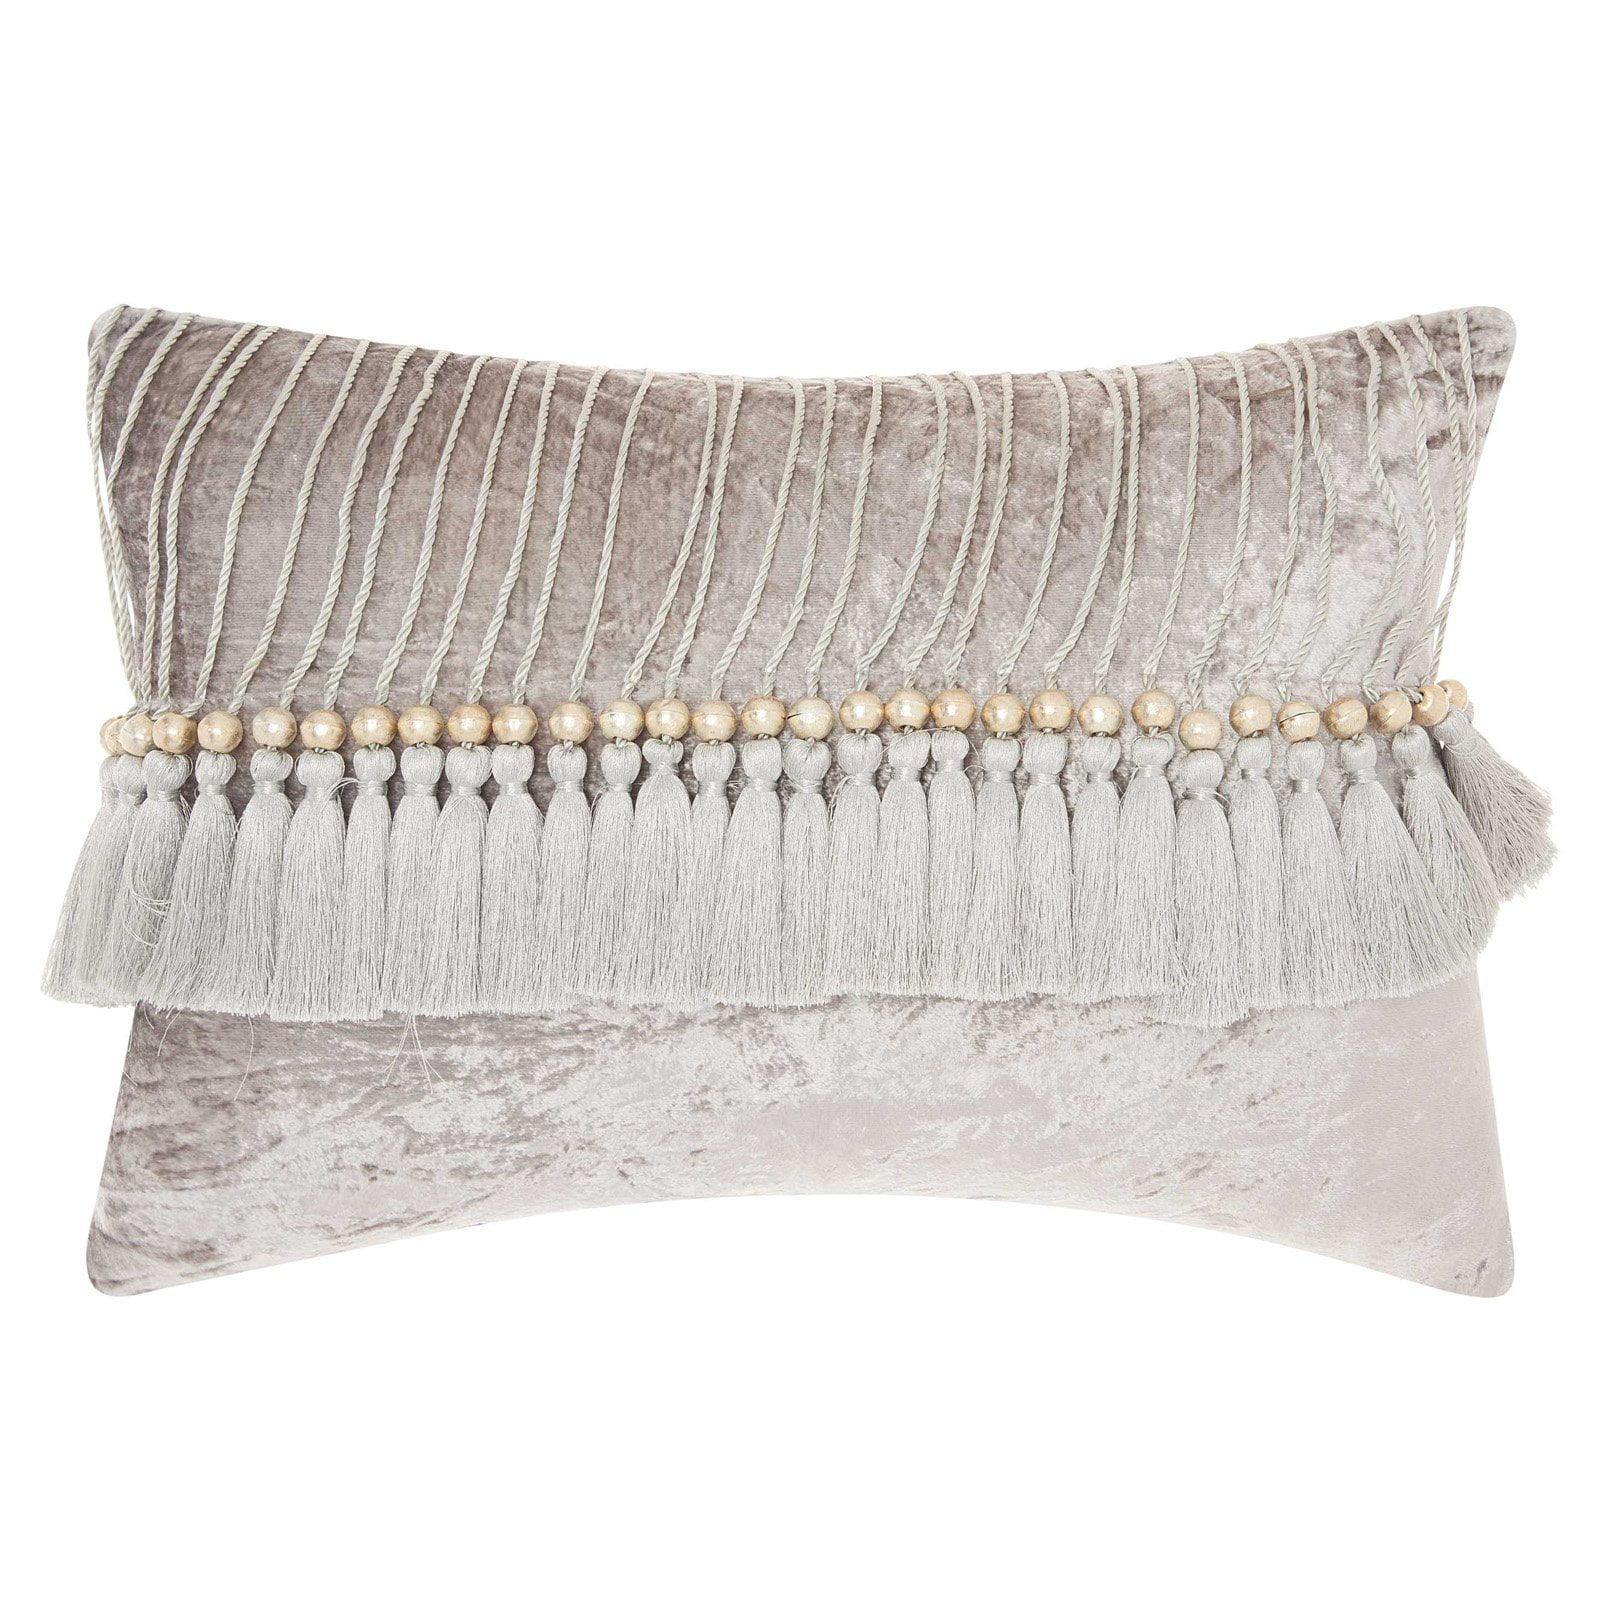 Nourison Life Styles Velvet Tassels Ivory Decorative Throw Pillow, Ivory